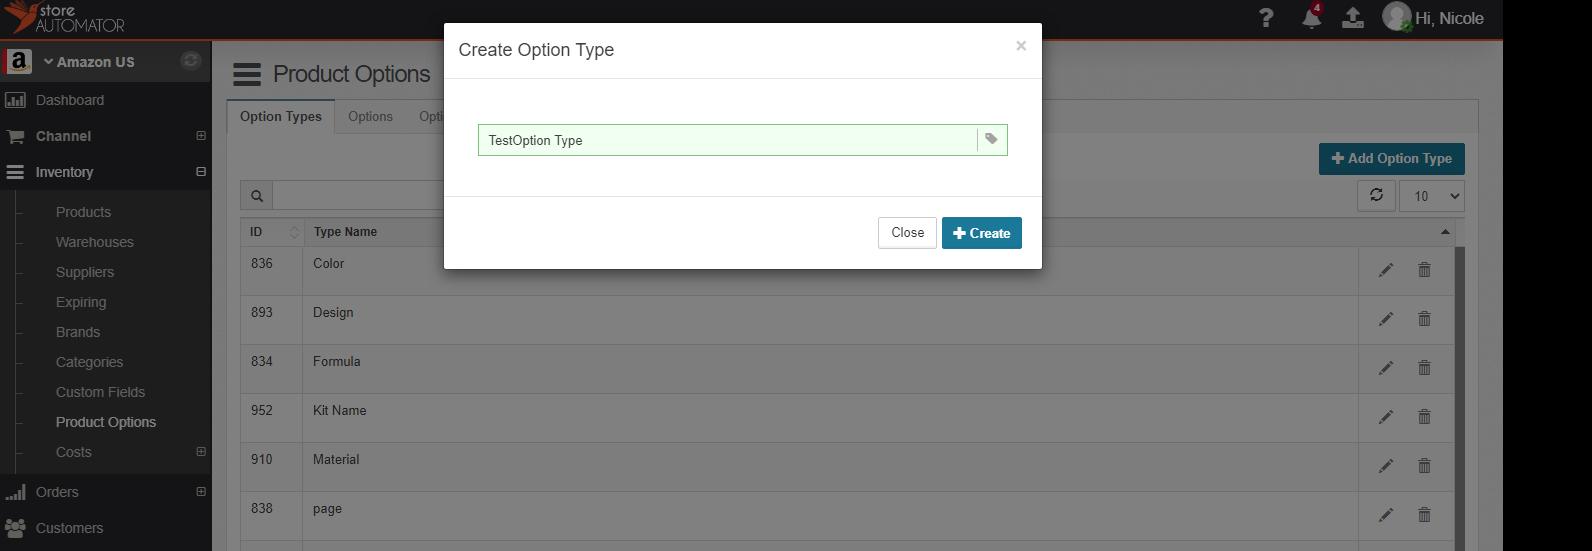 Create Product Option Type